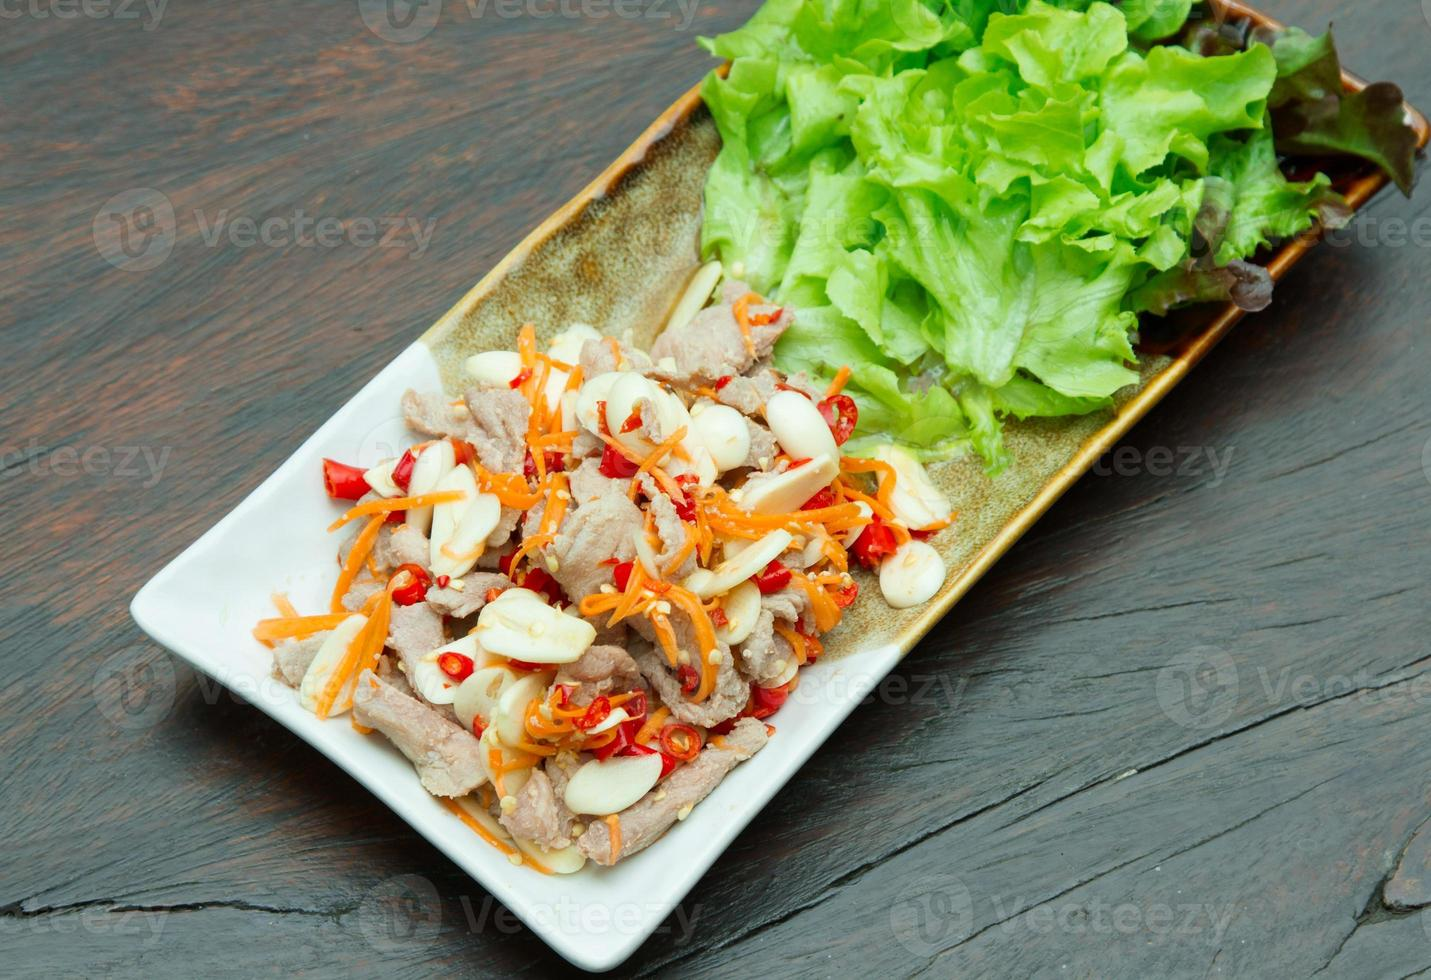 gekookt varkensvlees met limoen, knoflook en chili sauc foto